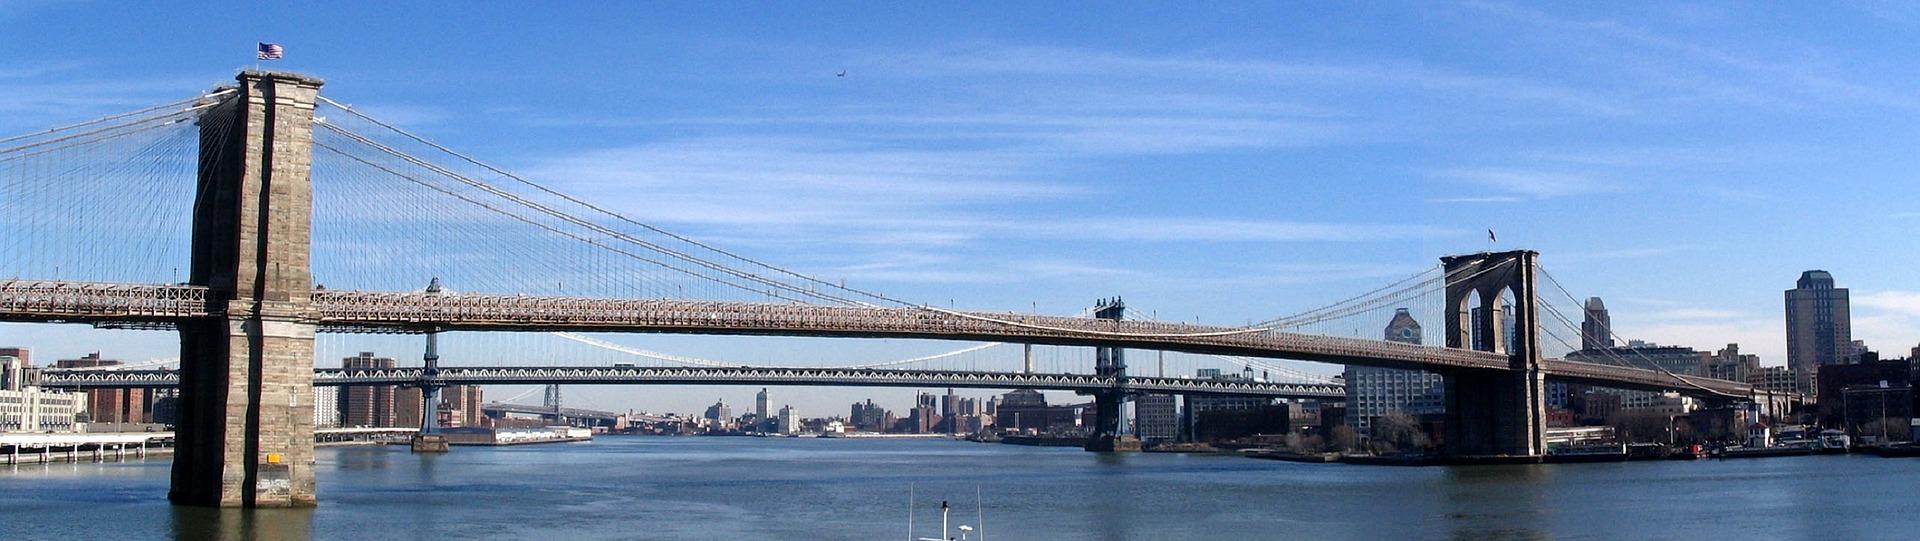 8 Tage in New York Amerika Städtereise ab 524€ Flug+Hotel